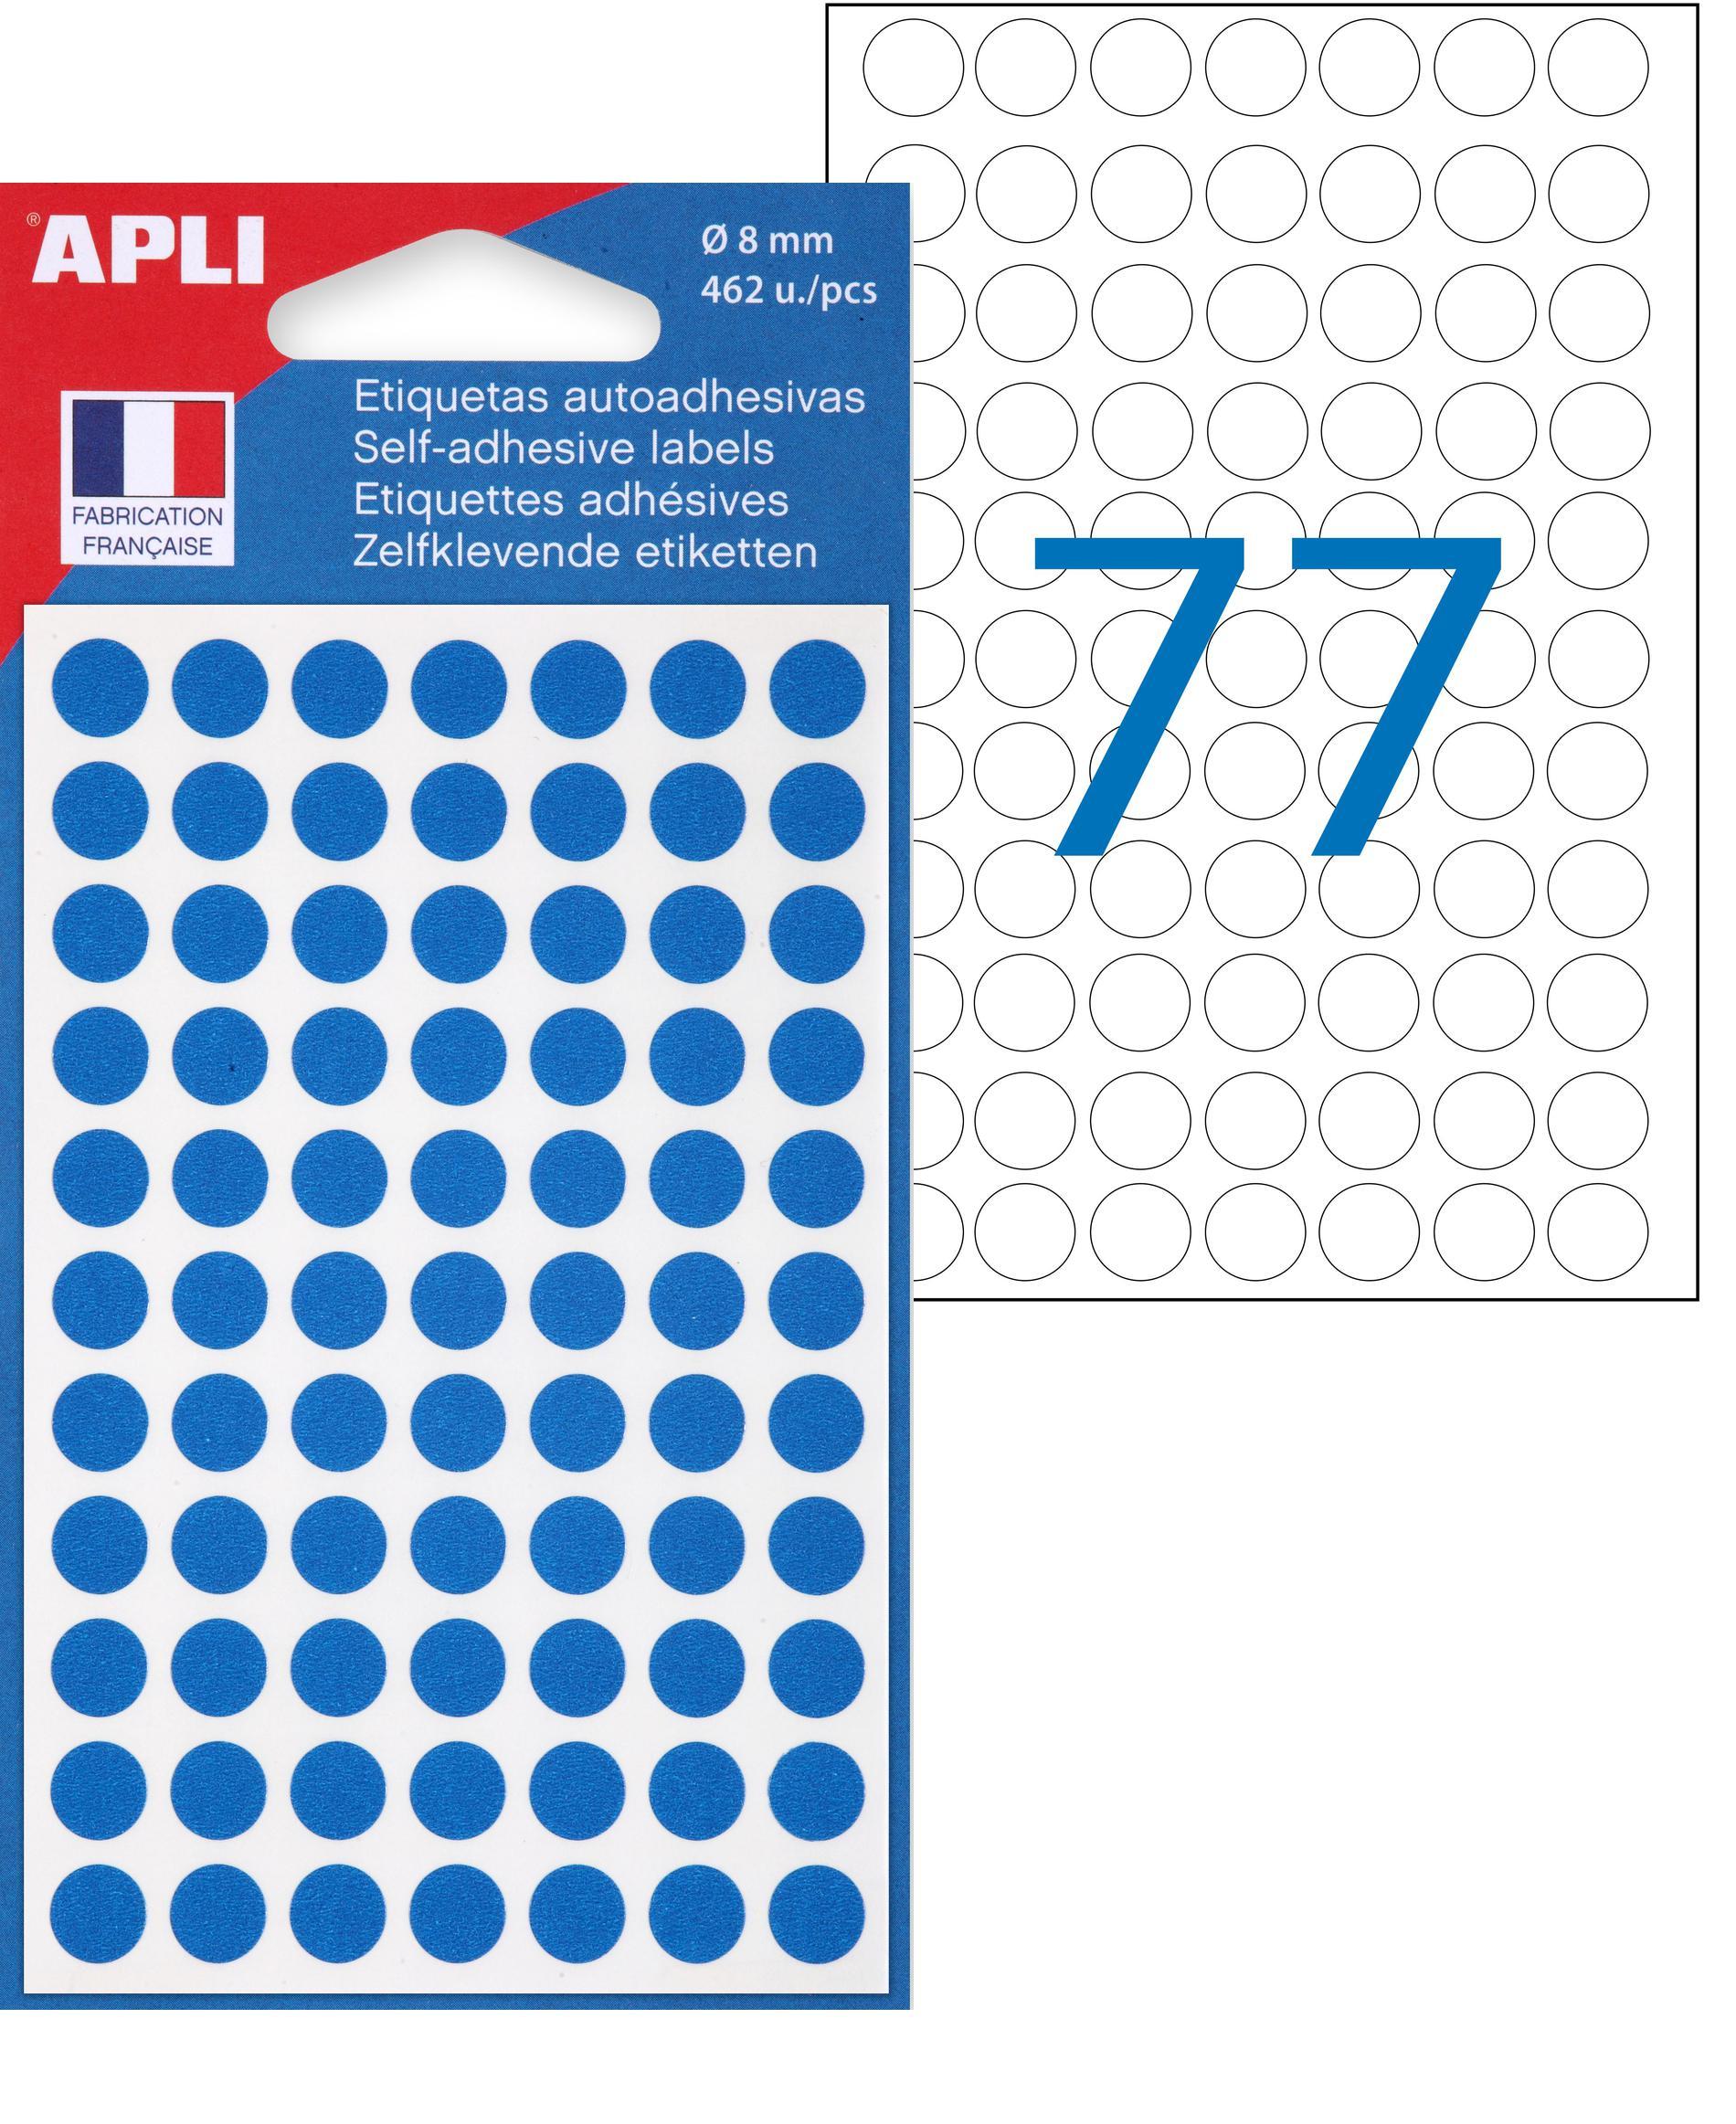 Apli Agipa - 462 Pastilles adhésives - bleu - diamètre 8 mm - réf 111832